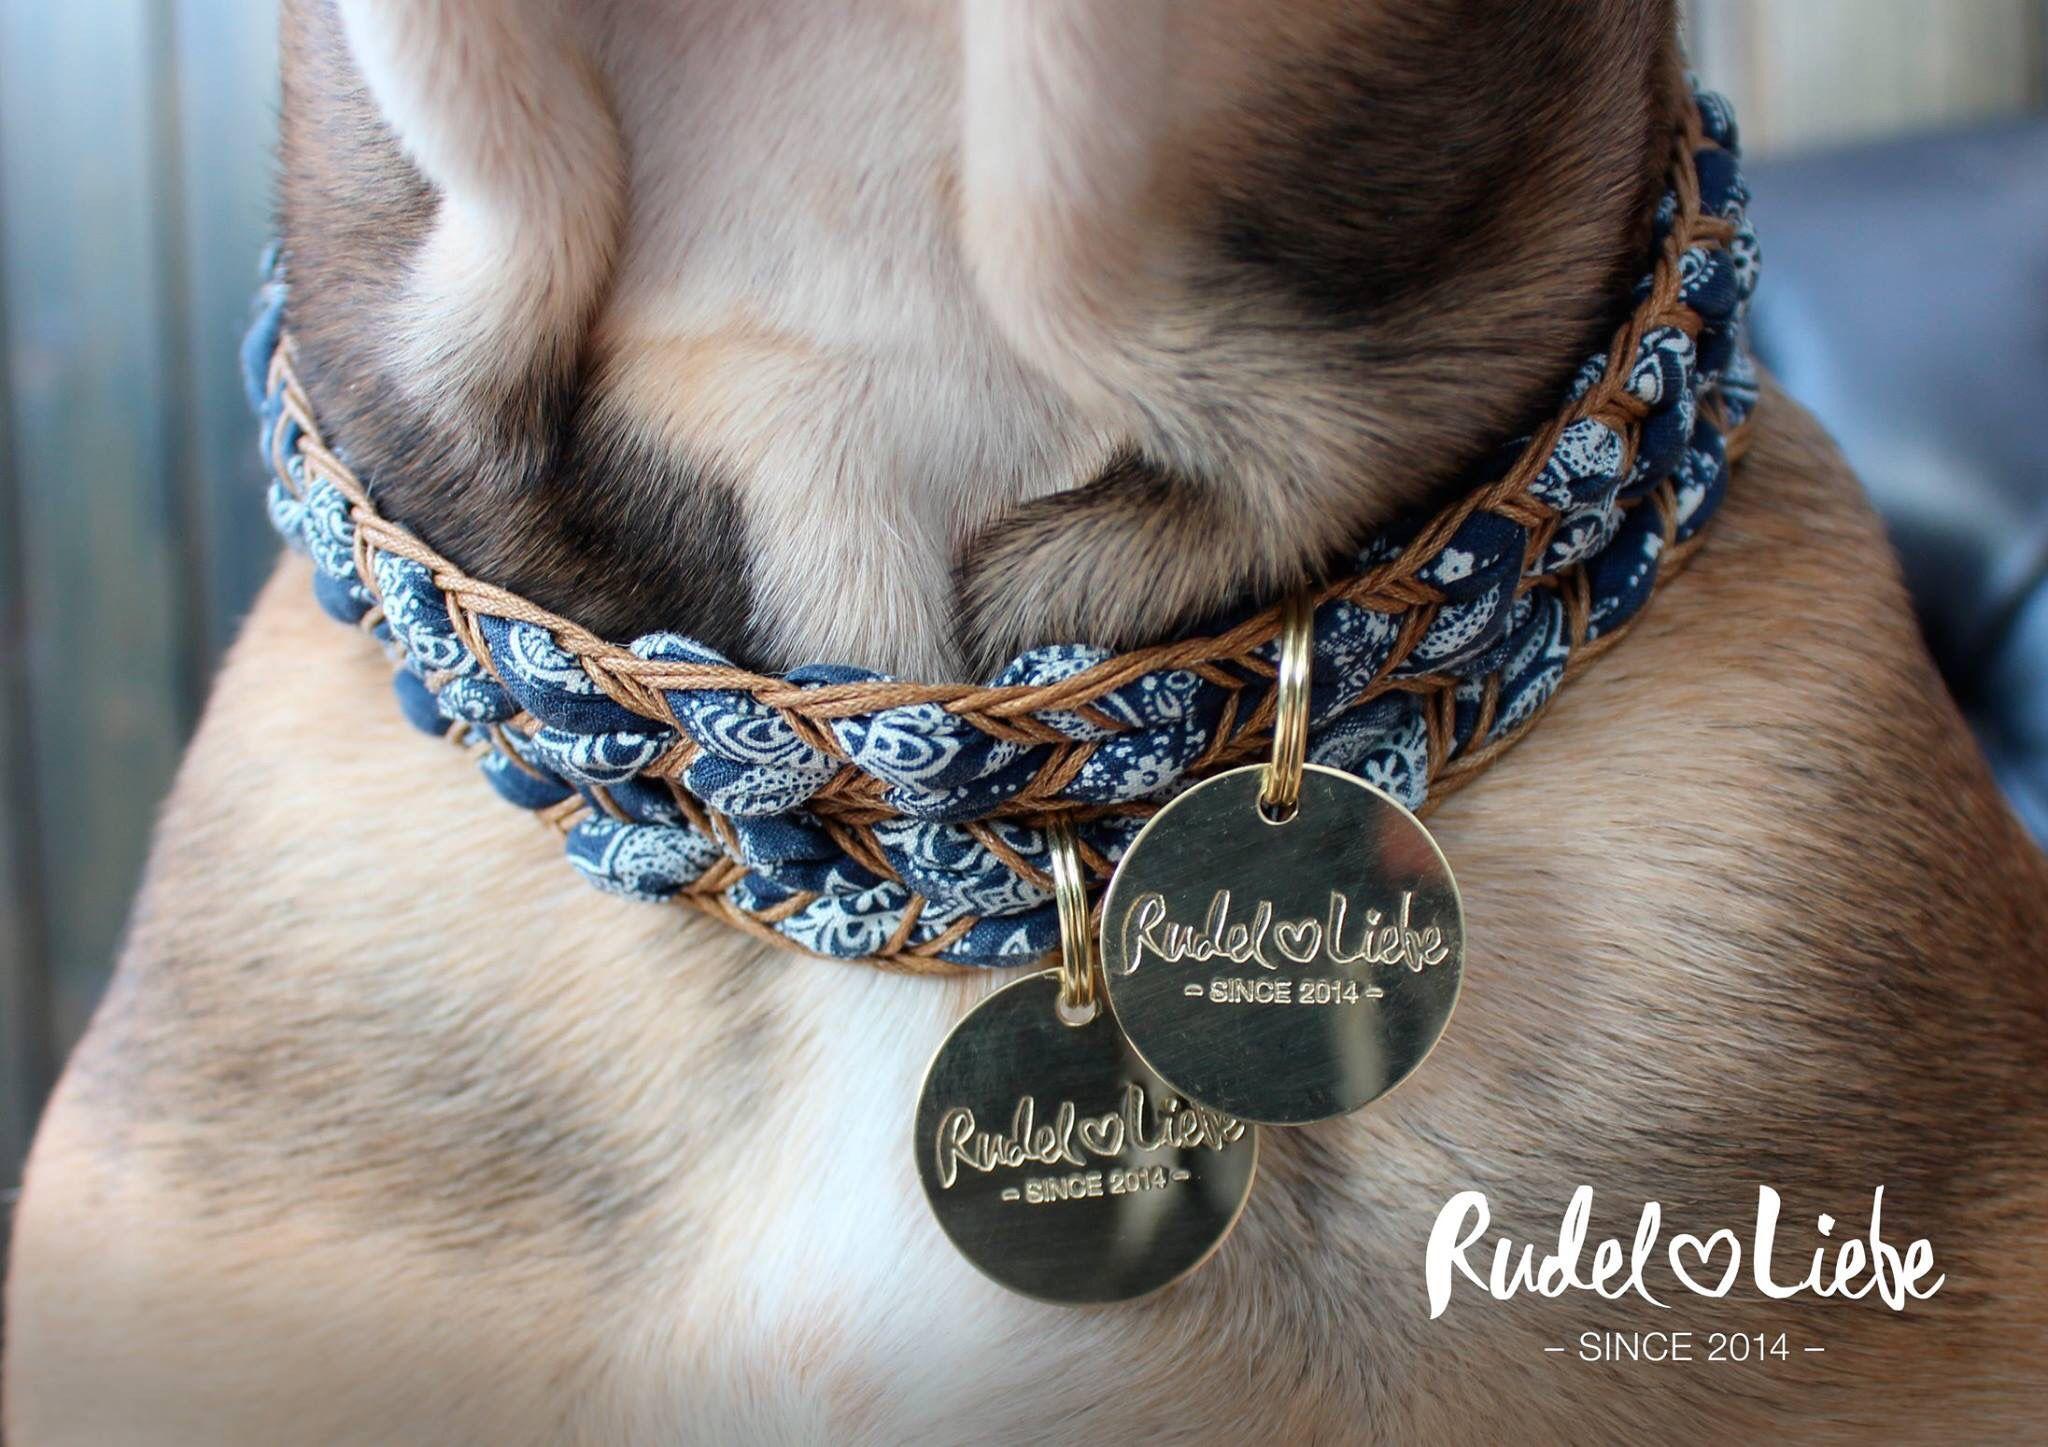 Bloom Dog Accessoire Www Rudelliebe De Halskette Hunde Hundehalskette Hund Bohodogcollars Hunde Accessoires Hundehalsband Hunde